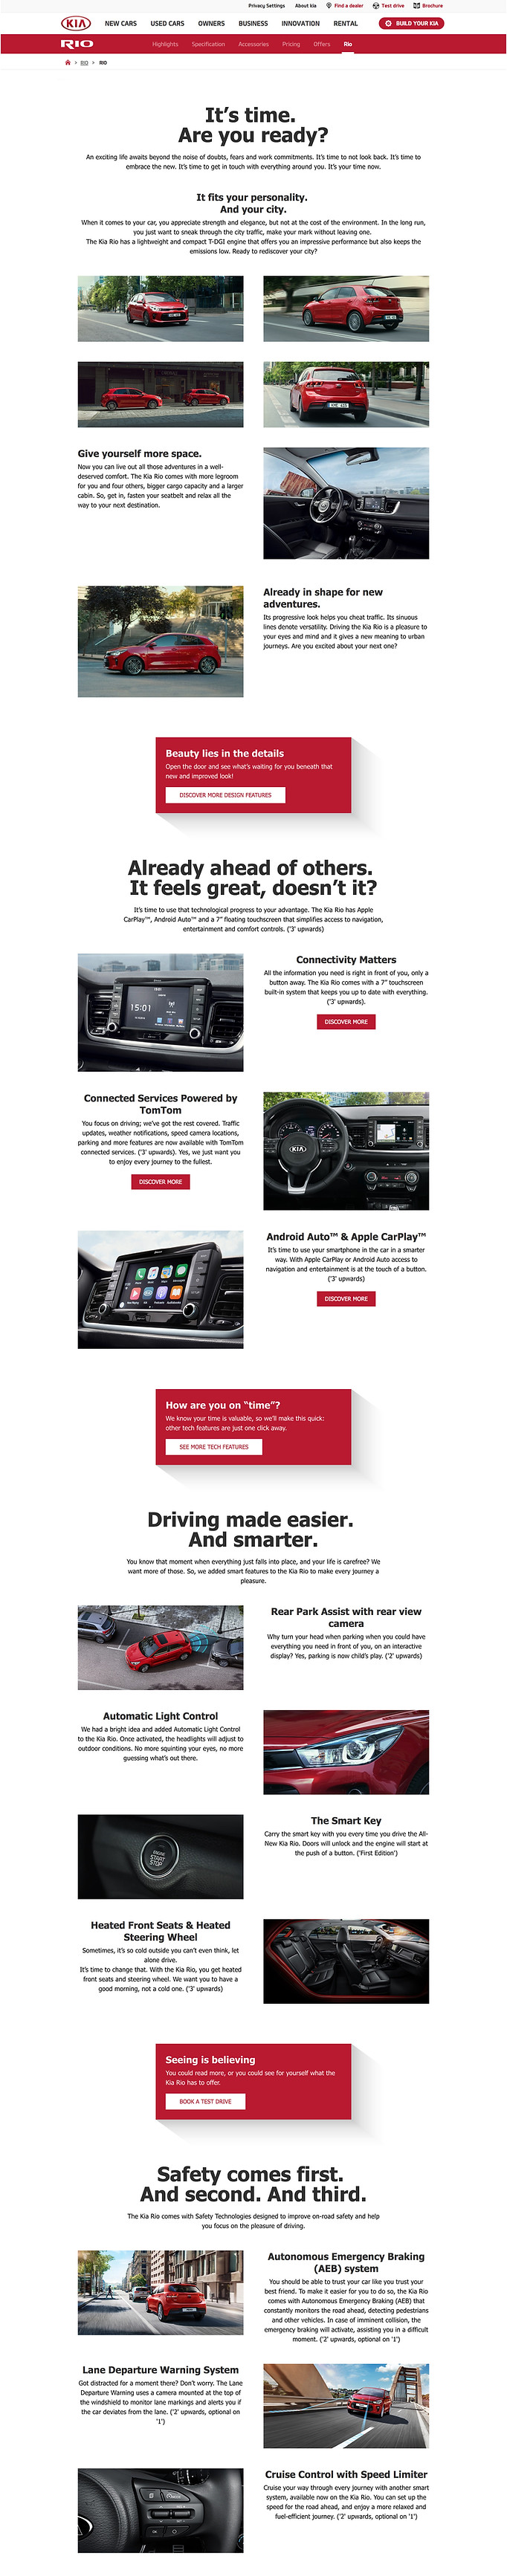 Kia Rio Product Page